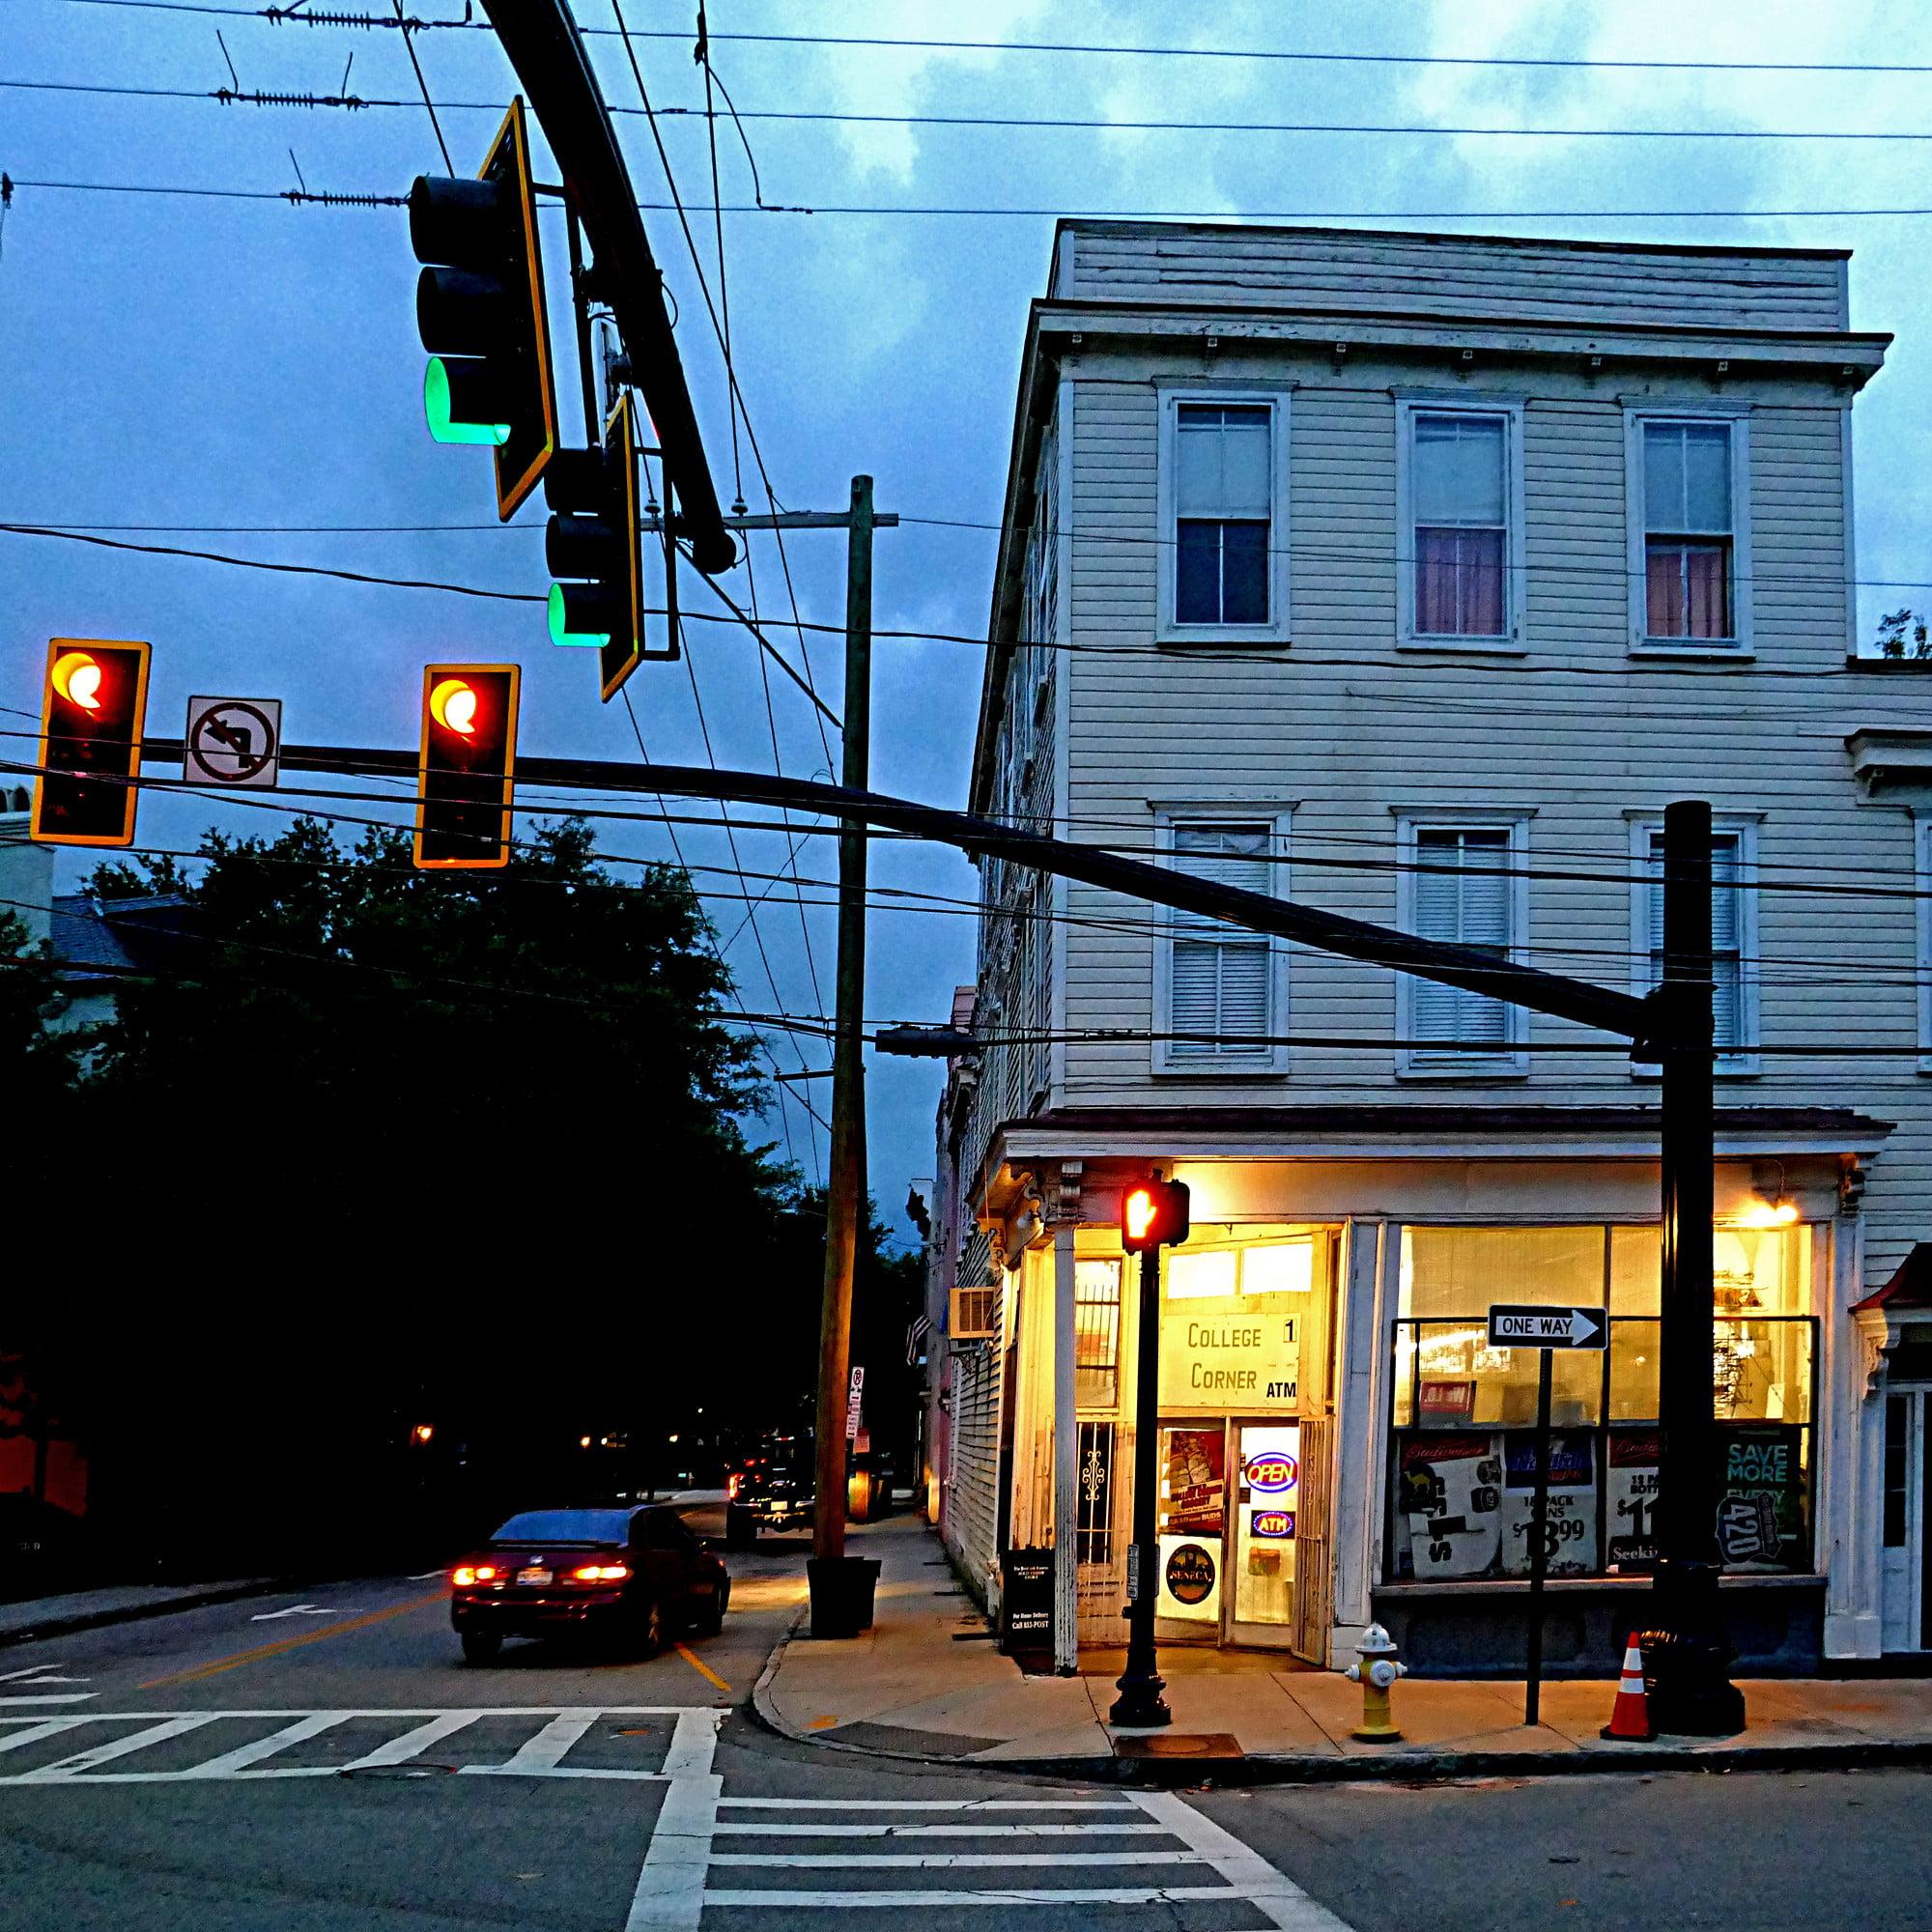 Anthony Bourdain Charleston - Charleston, South Carolina, USA - photo by Pom' under CC BY-SA 2.0